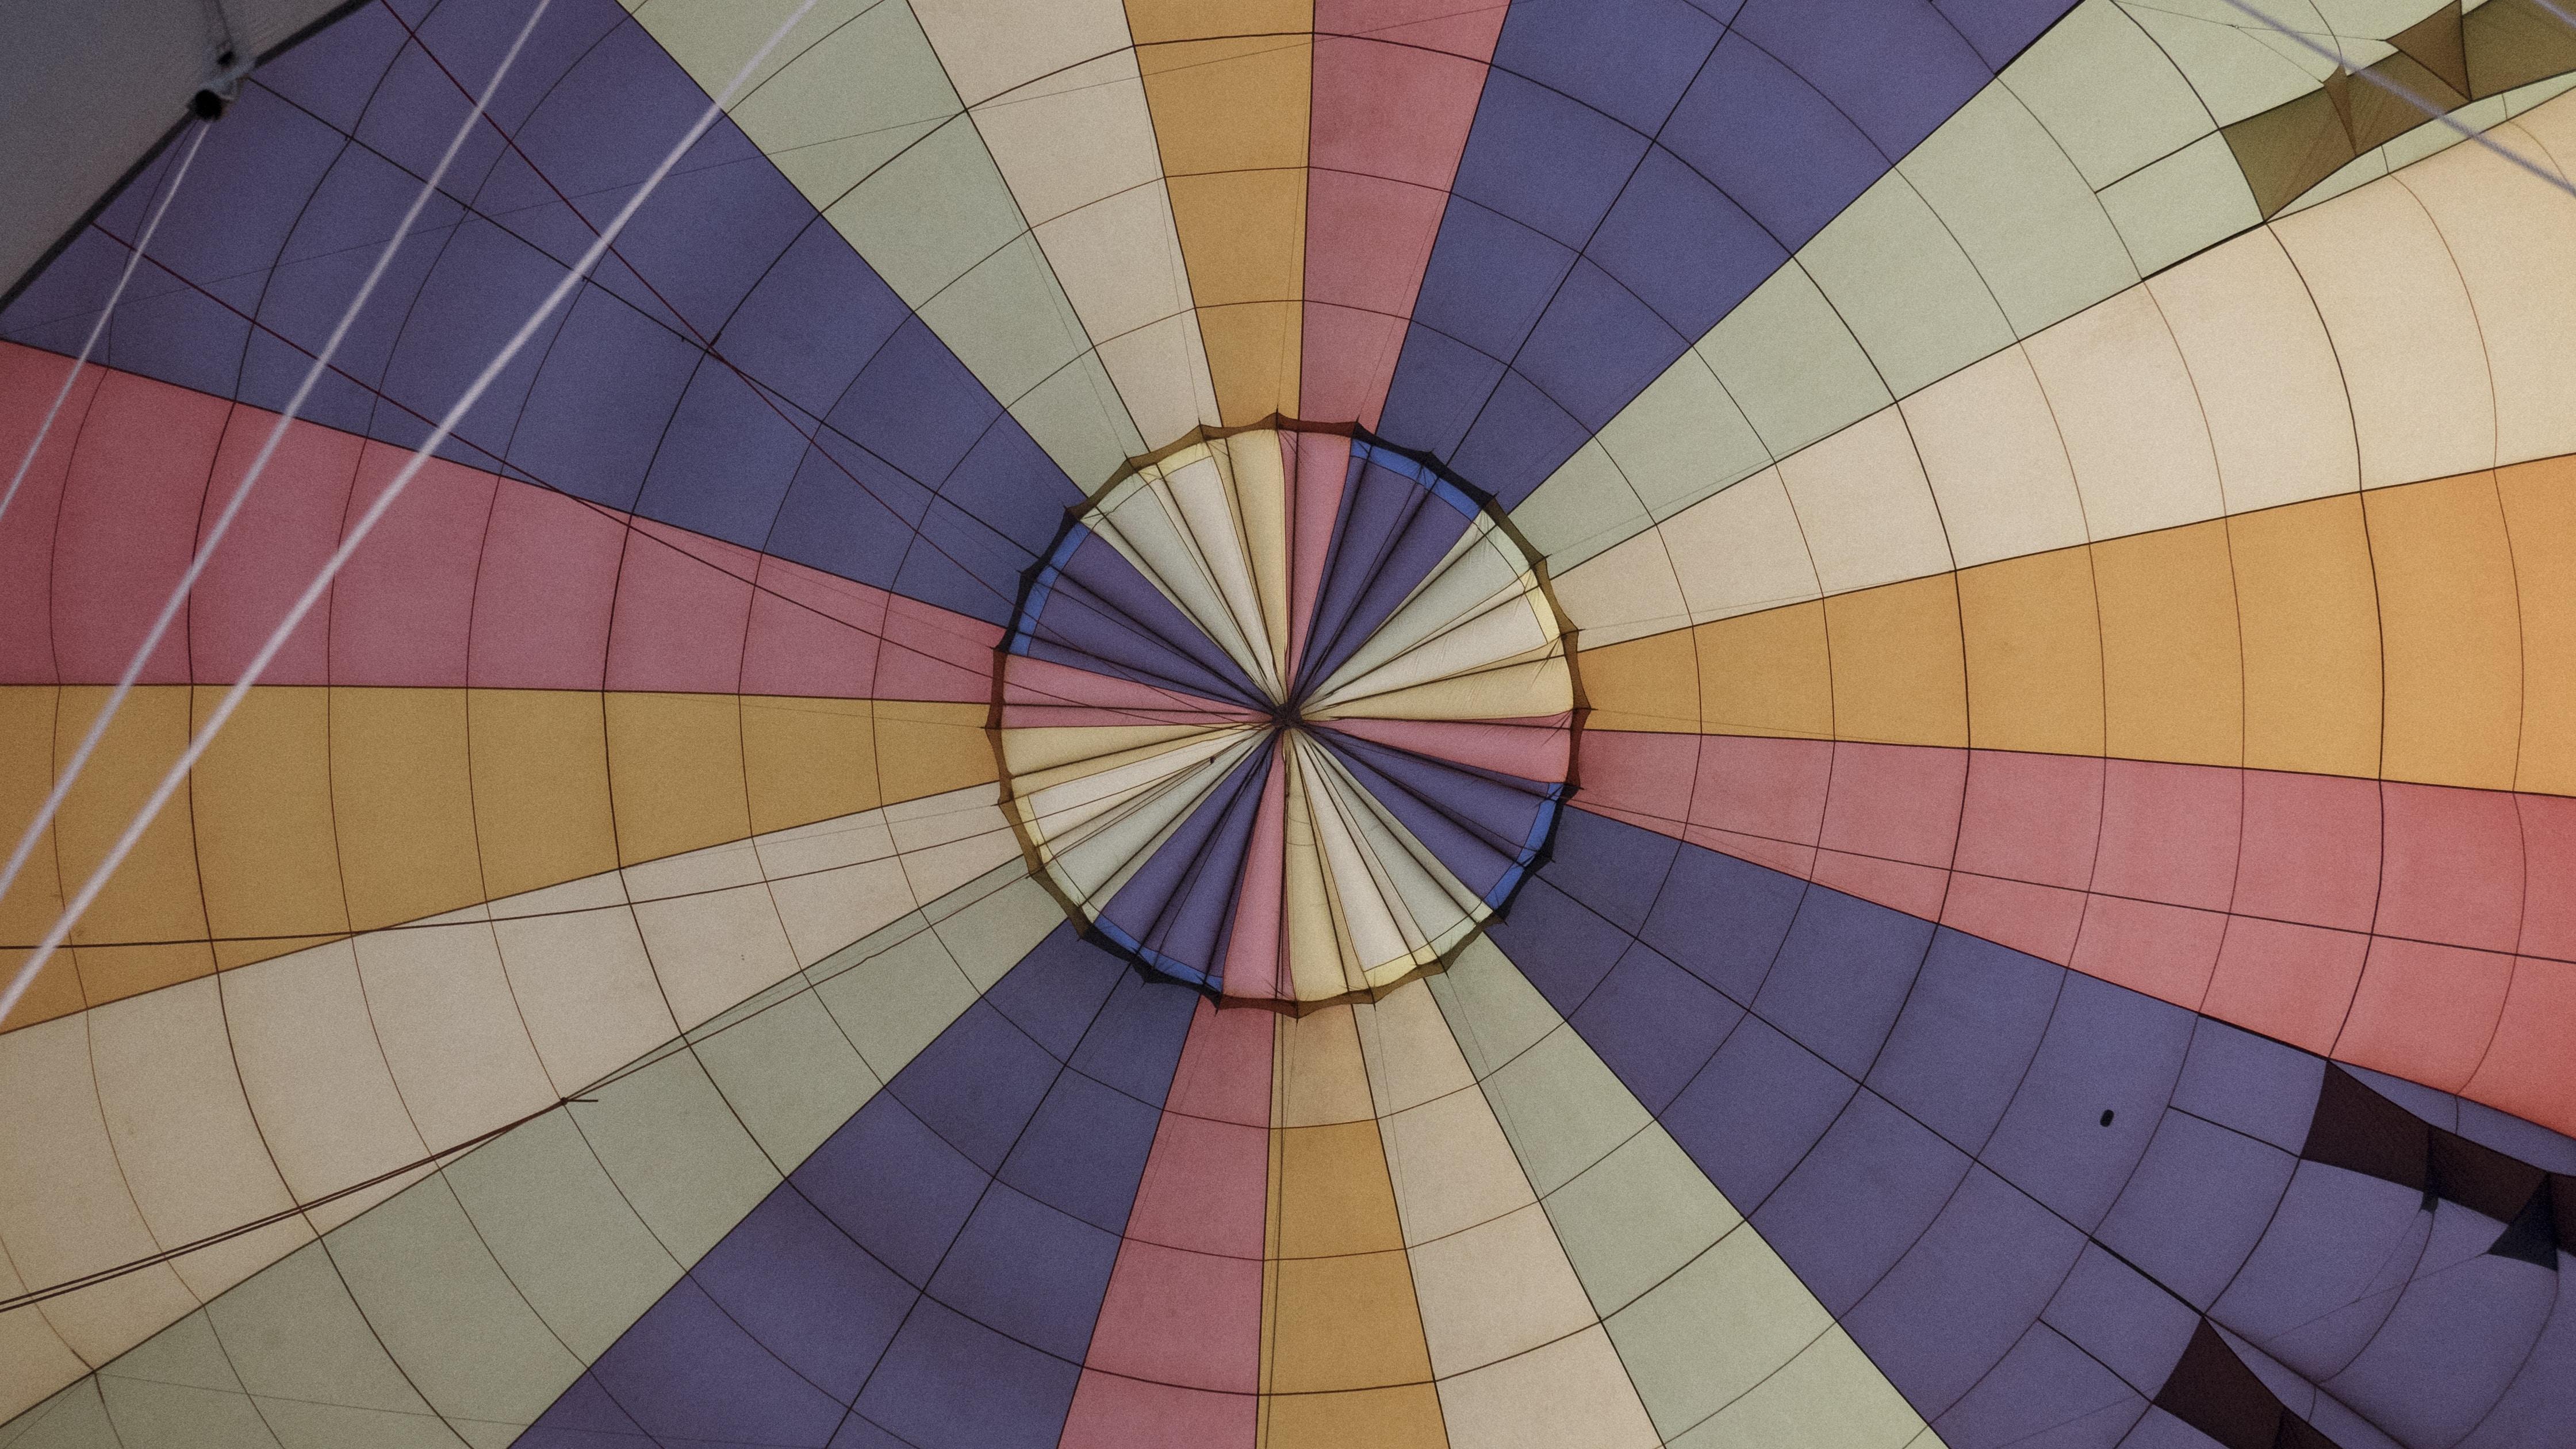 low angle photography of parabolic umbrella